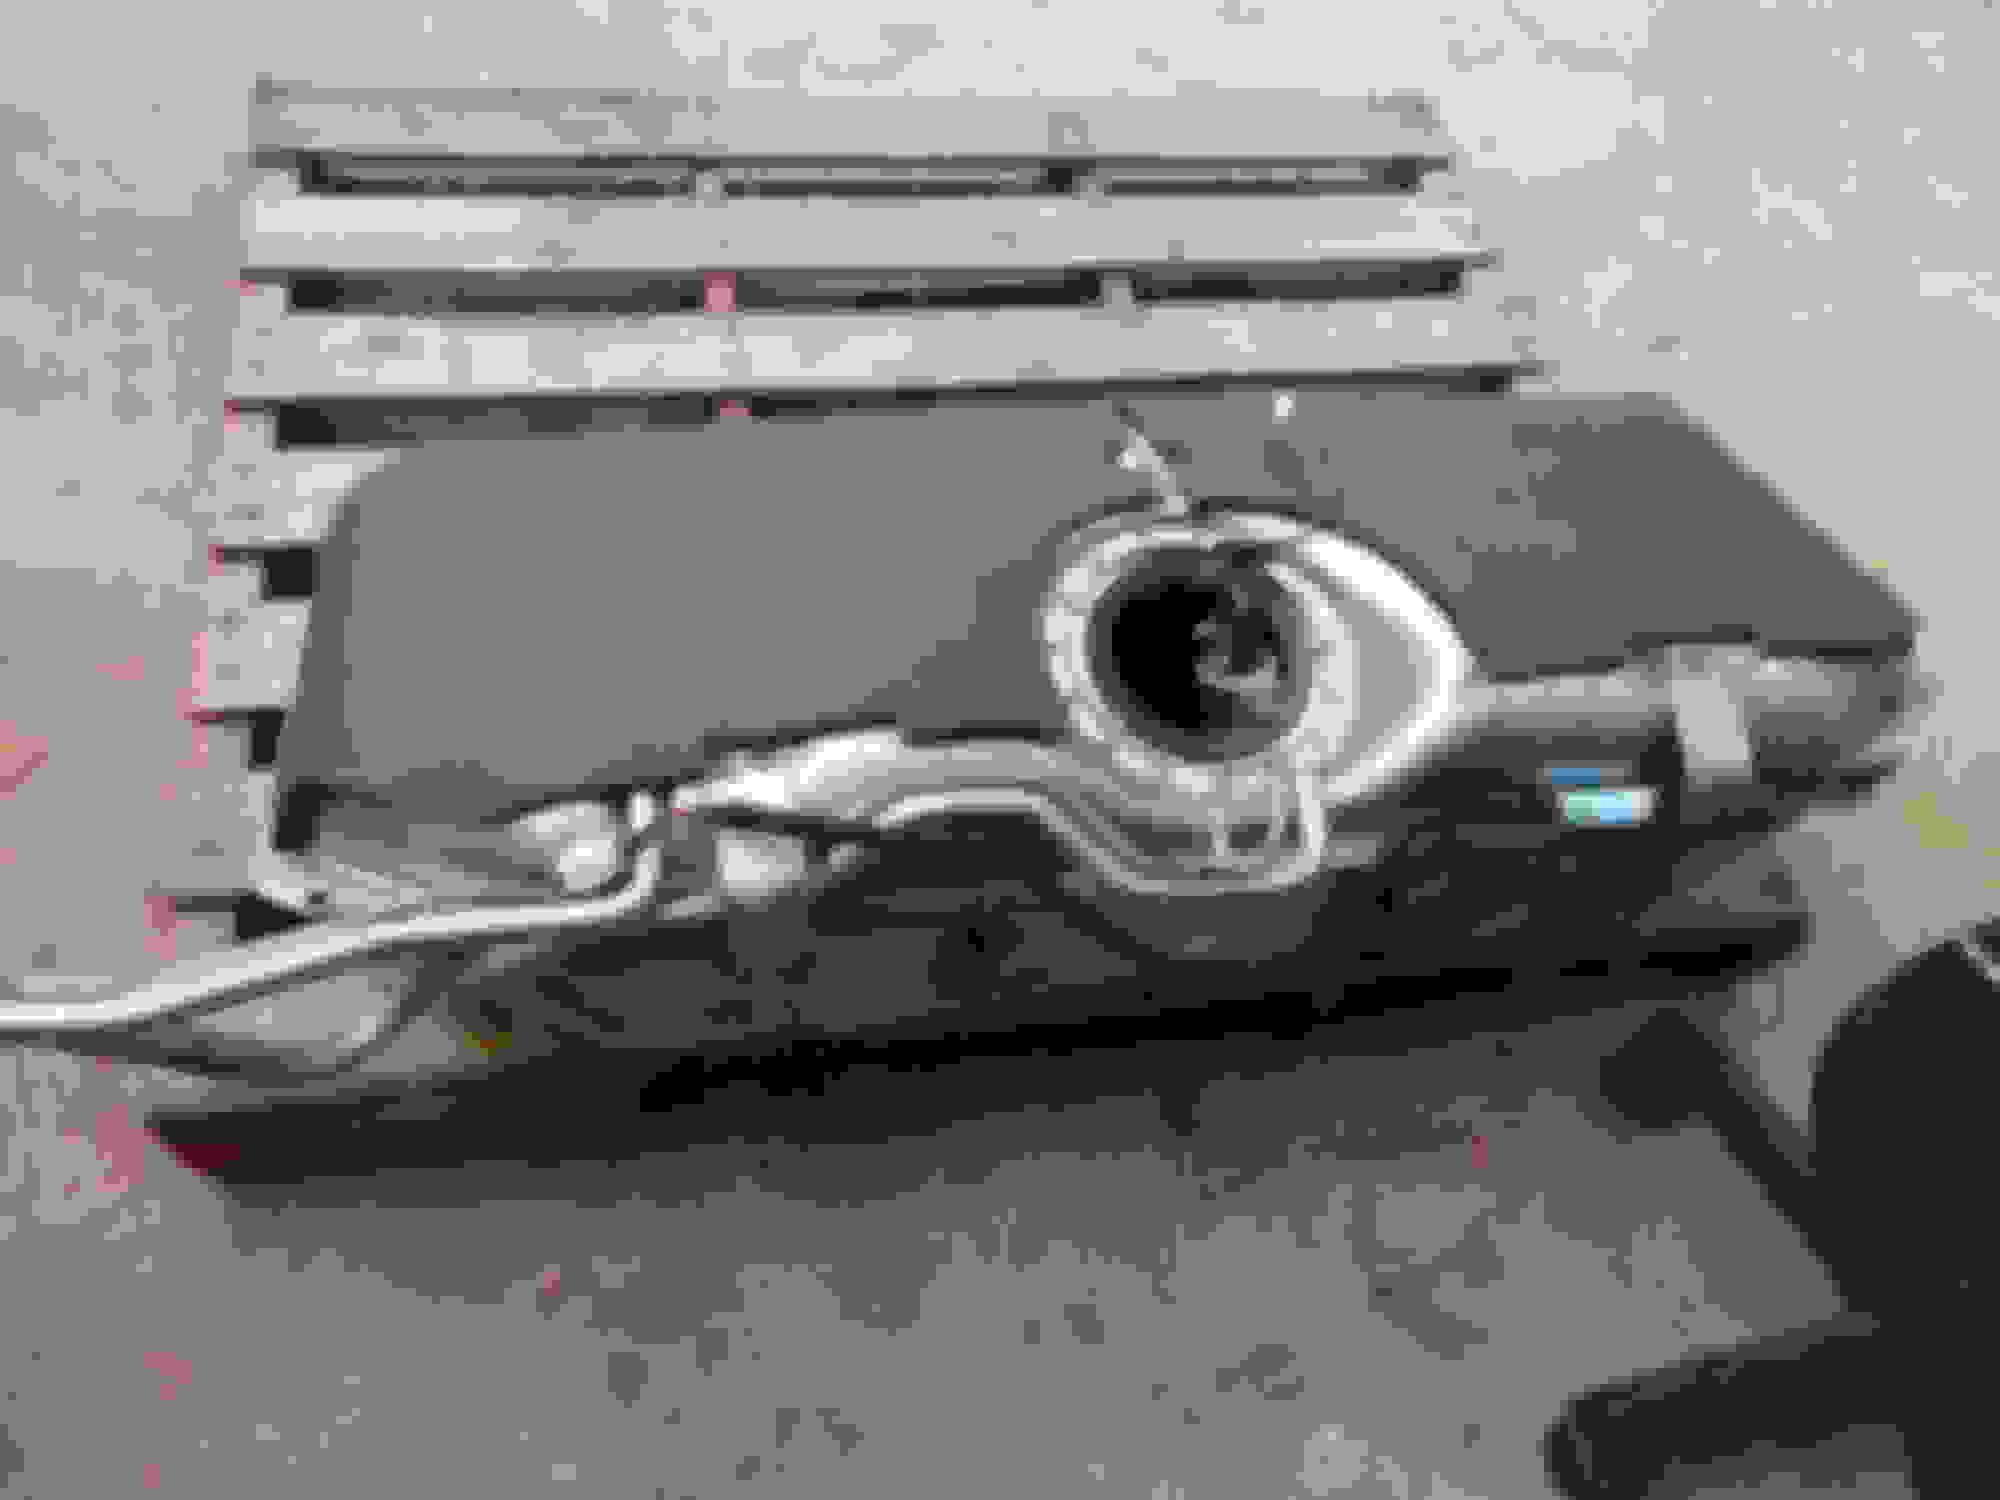 hight resolution of 2000 jaguar xk8 fuel tank removed